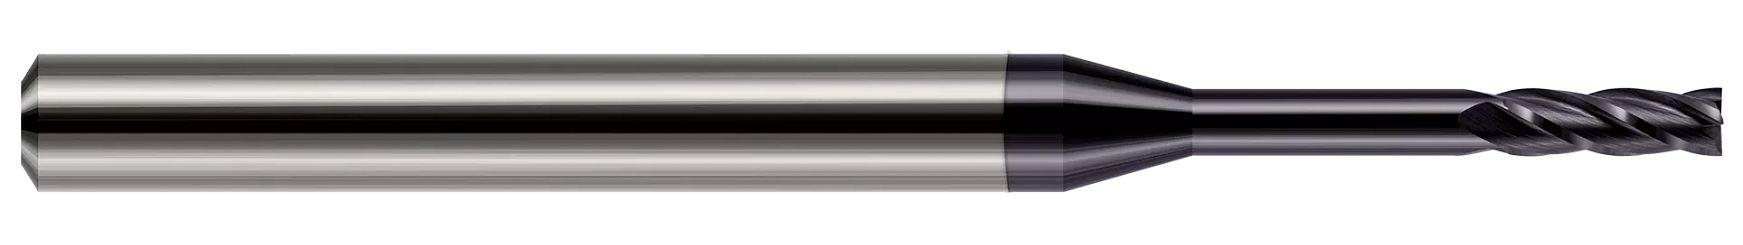 Miniature End Mills - Square - Long Reach, Standard Flute